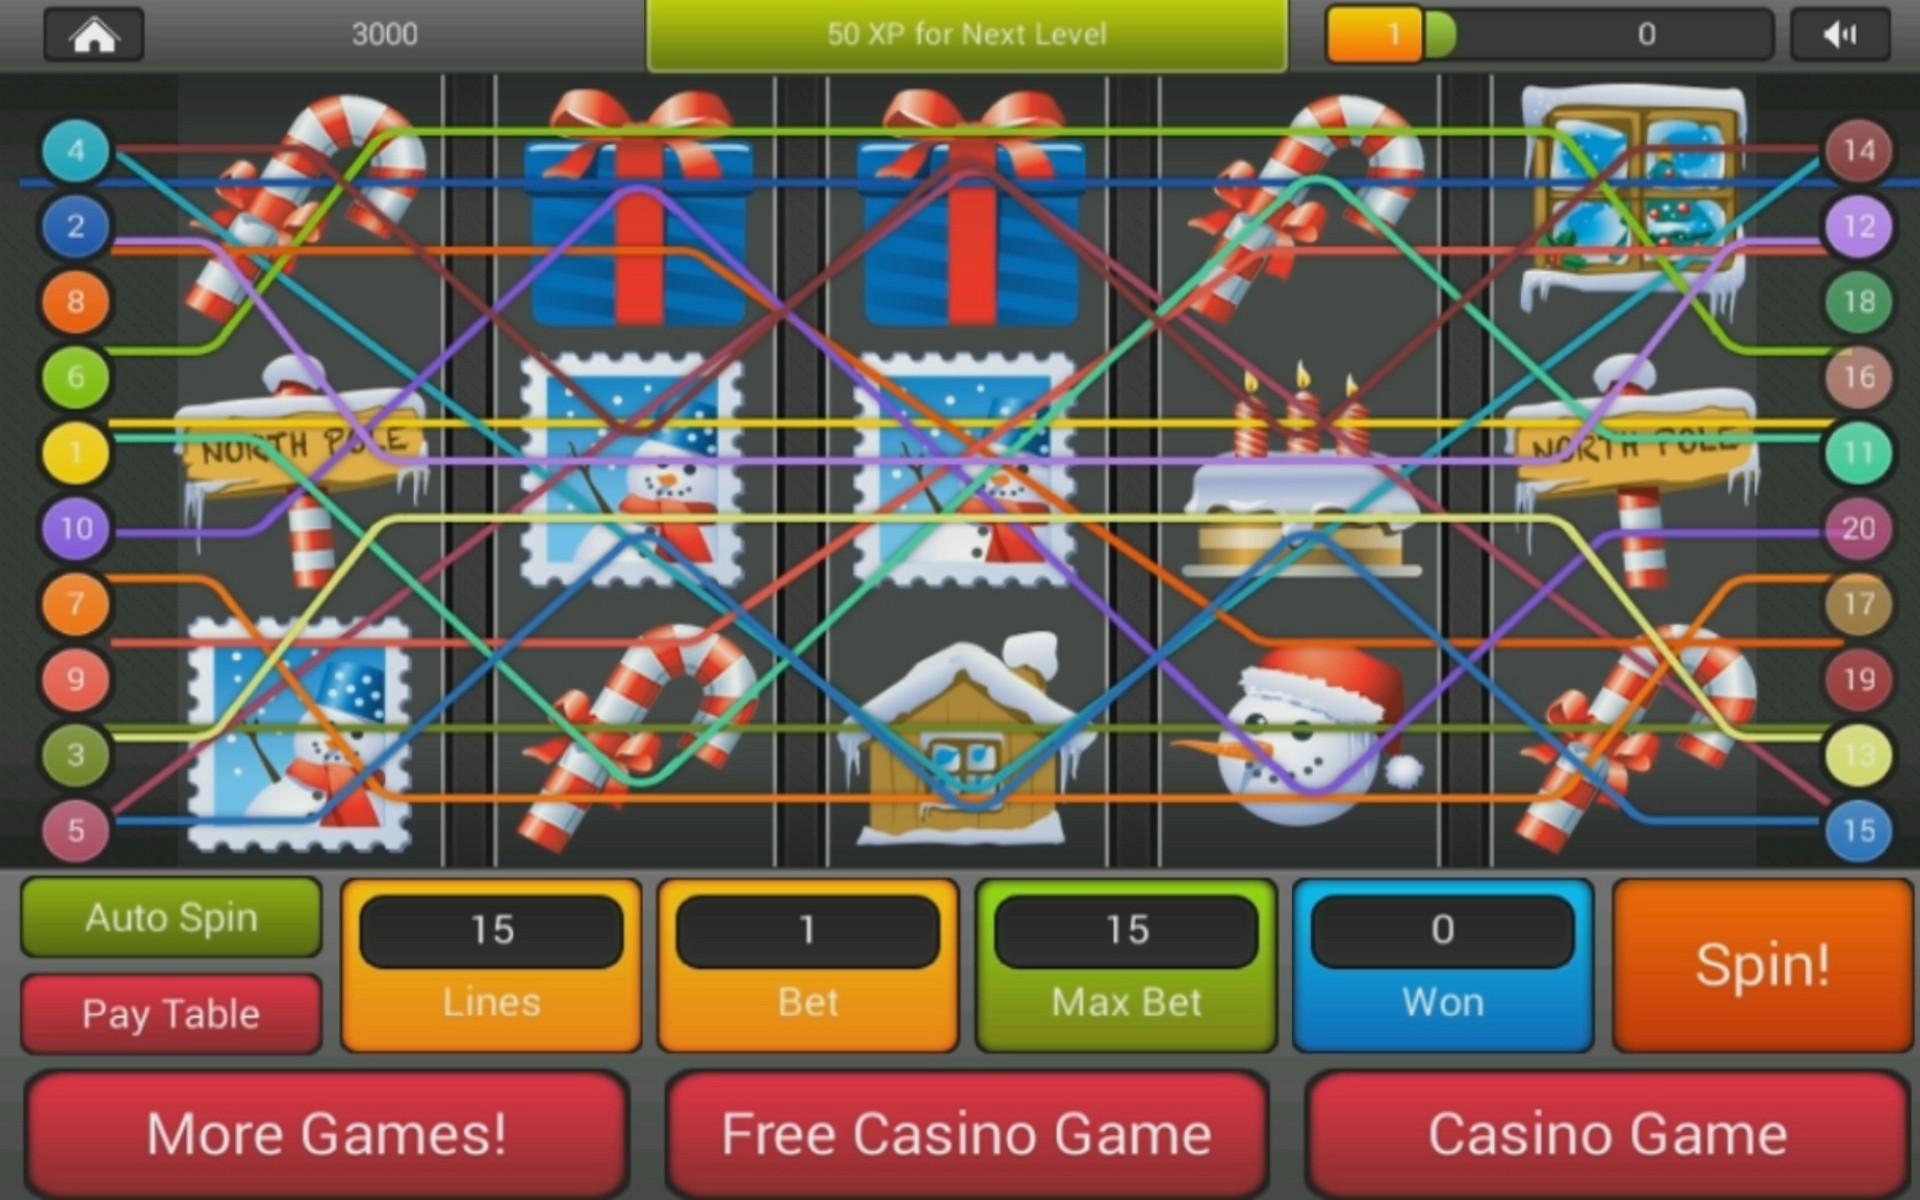 Free casino game.com gambling ppc